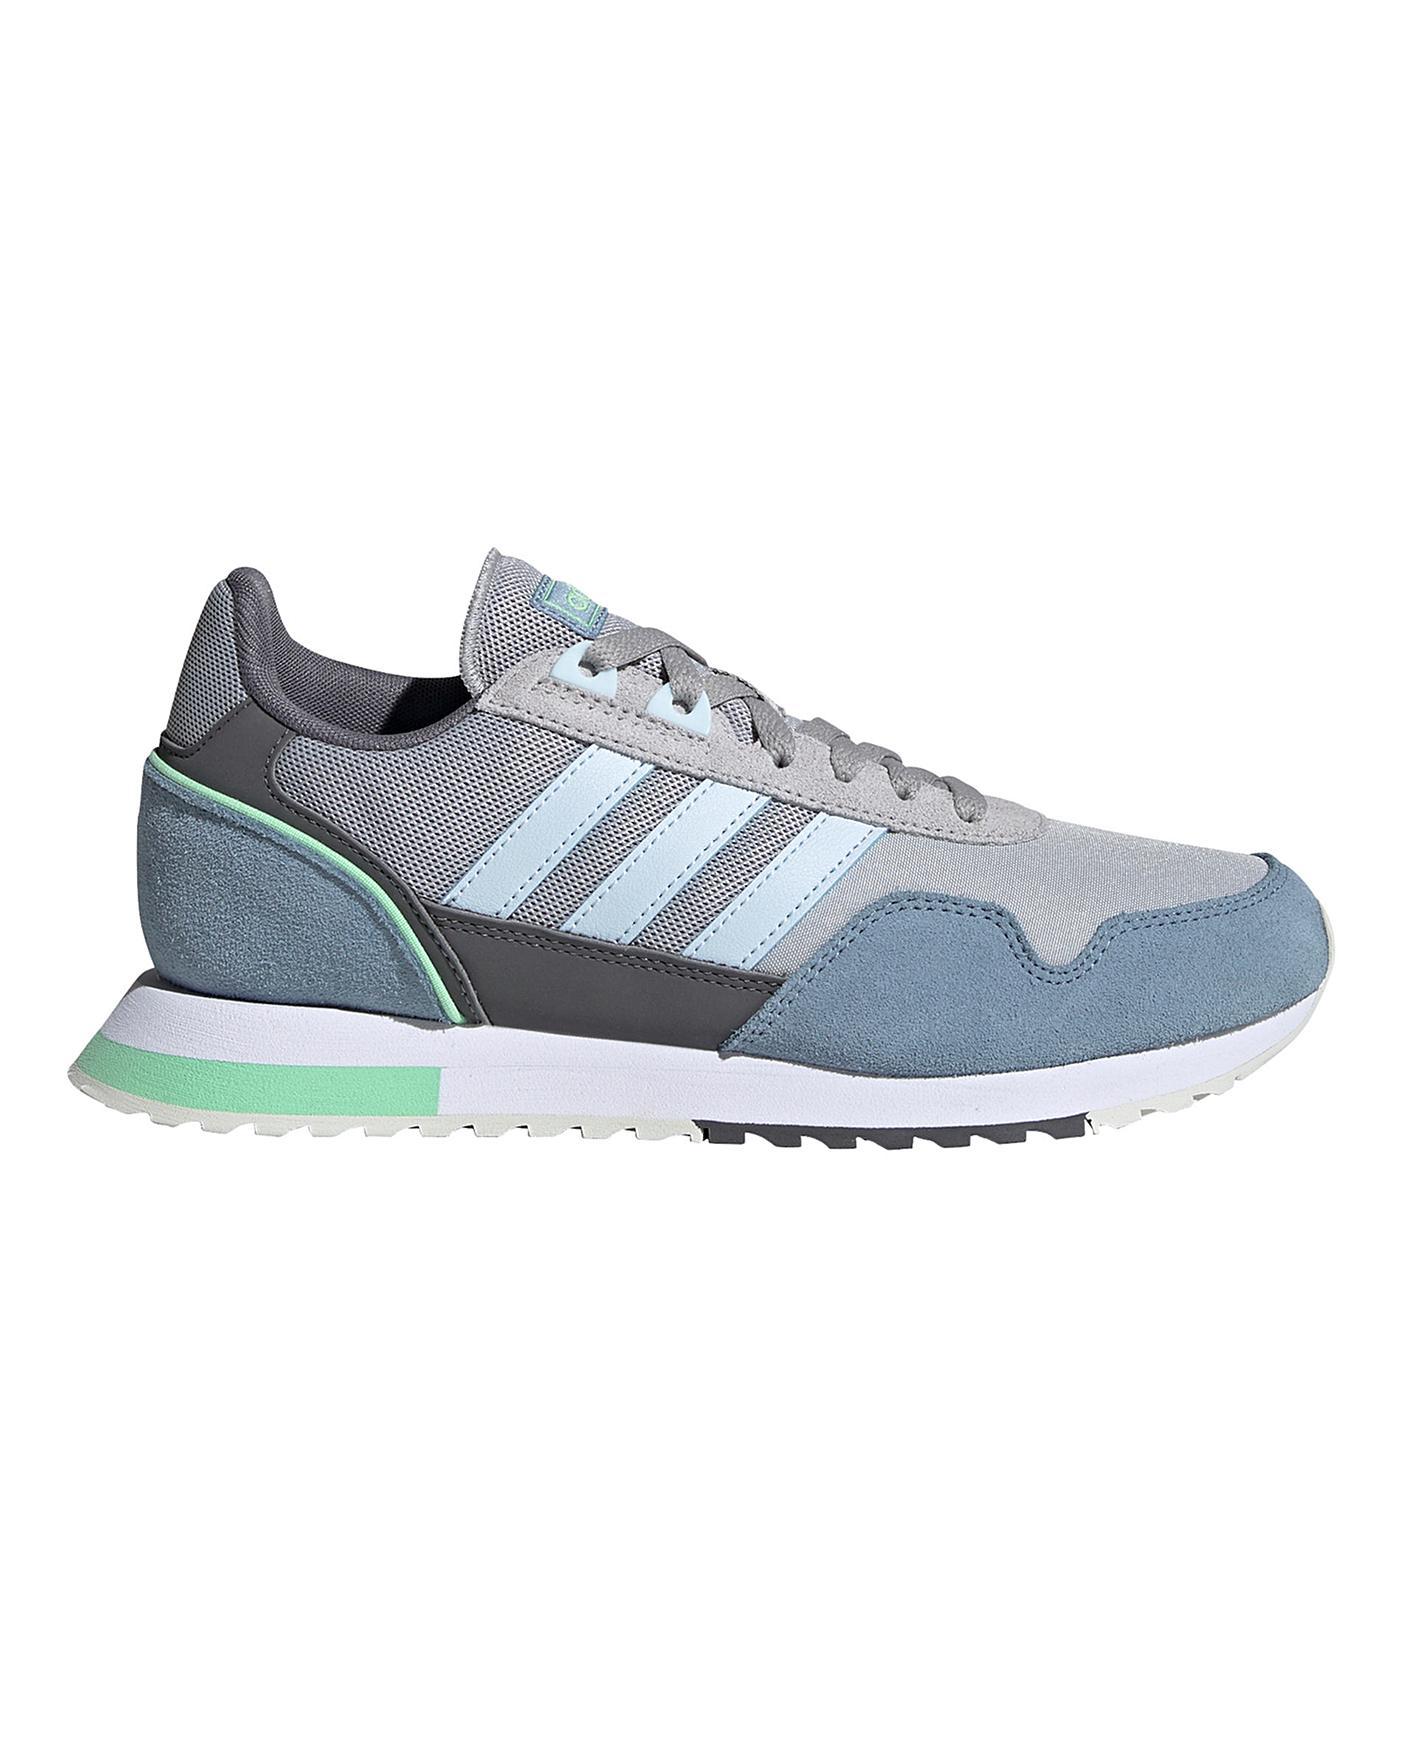 adidas 8k trainers